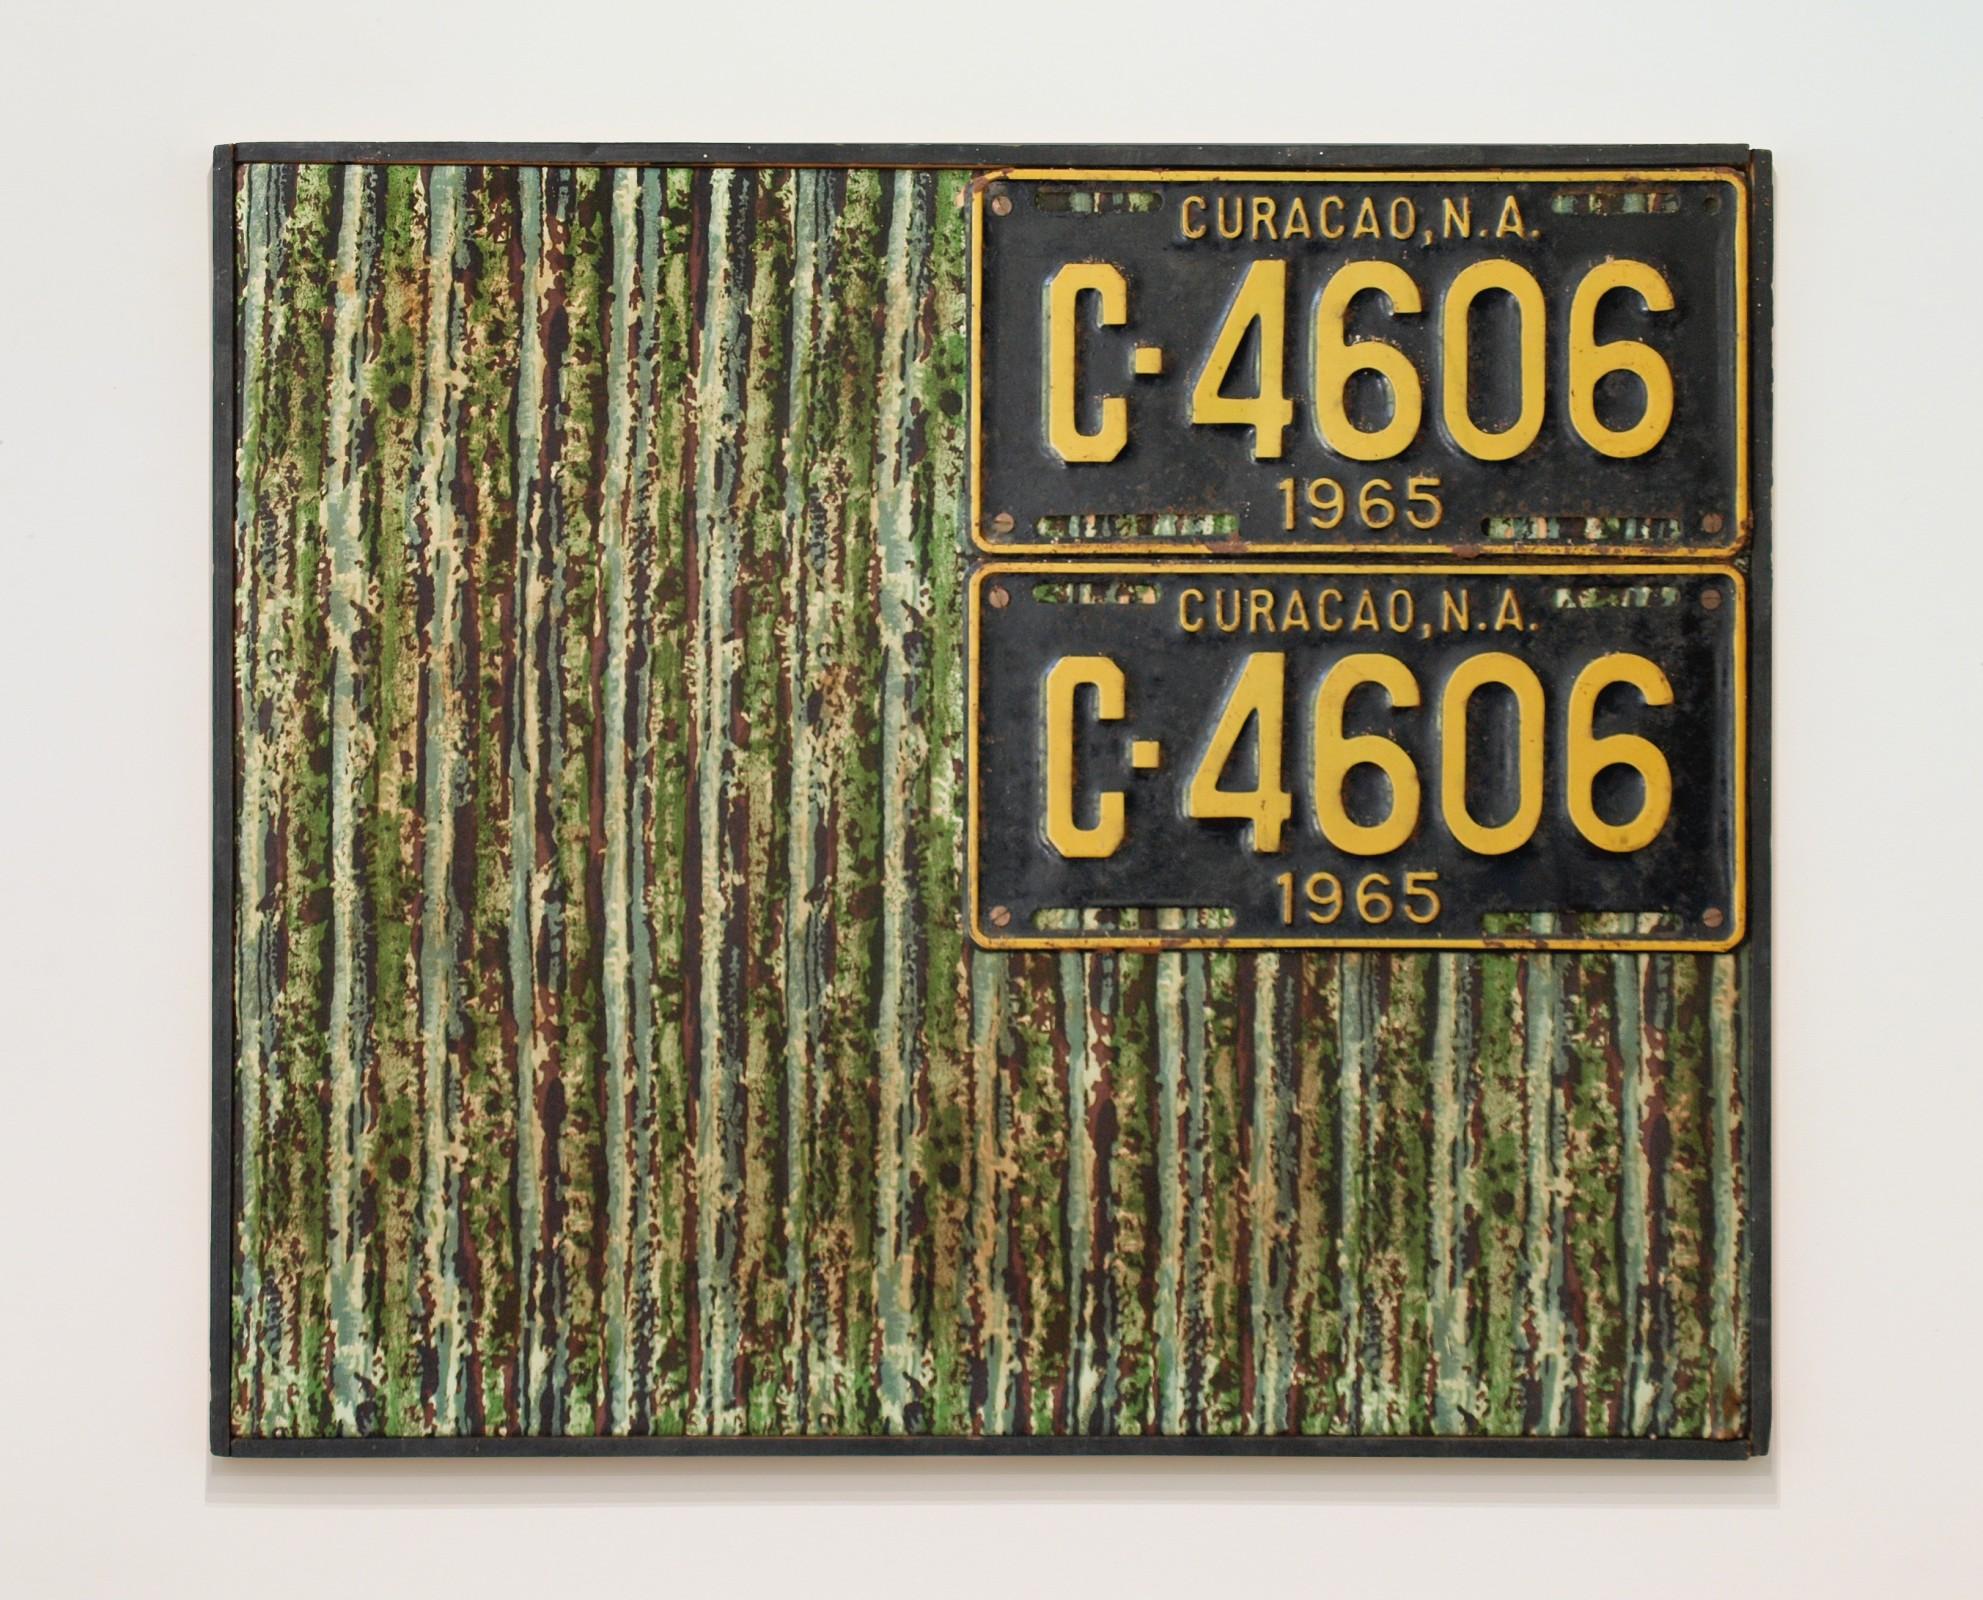 "<span class=""link fancybox-details-link""><a href=""/exhibitions/555/works/artworks_standalone11045/"">View Detail Page</a></span><div class=""artist""><span class=""artist""><strong>JAN HENDERIKSE</strong></span></div><div class=""title""><em>PP 10 A</em>, 1968</div><div class=""medium"">License plates on fabric on panel</div><div class=""dimensions""><div class=""dimensions"">19 3/4 x 23 3/4 inches</div><div class=""dimensions"">(50 x 60 cm)</div></div>"